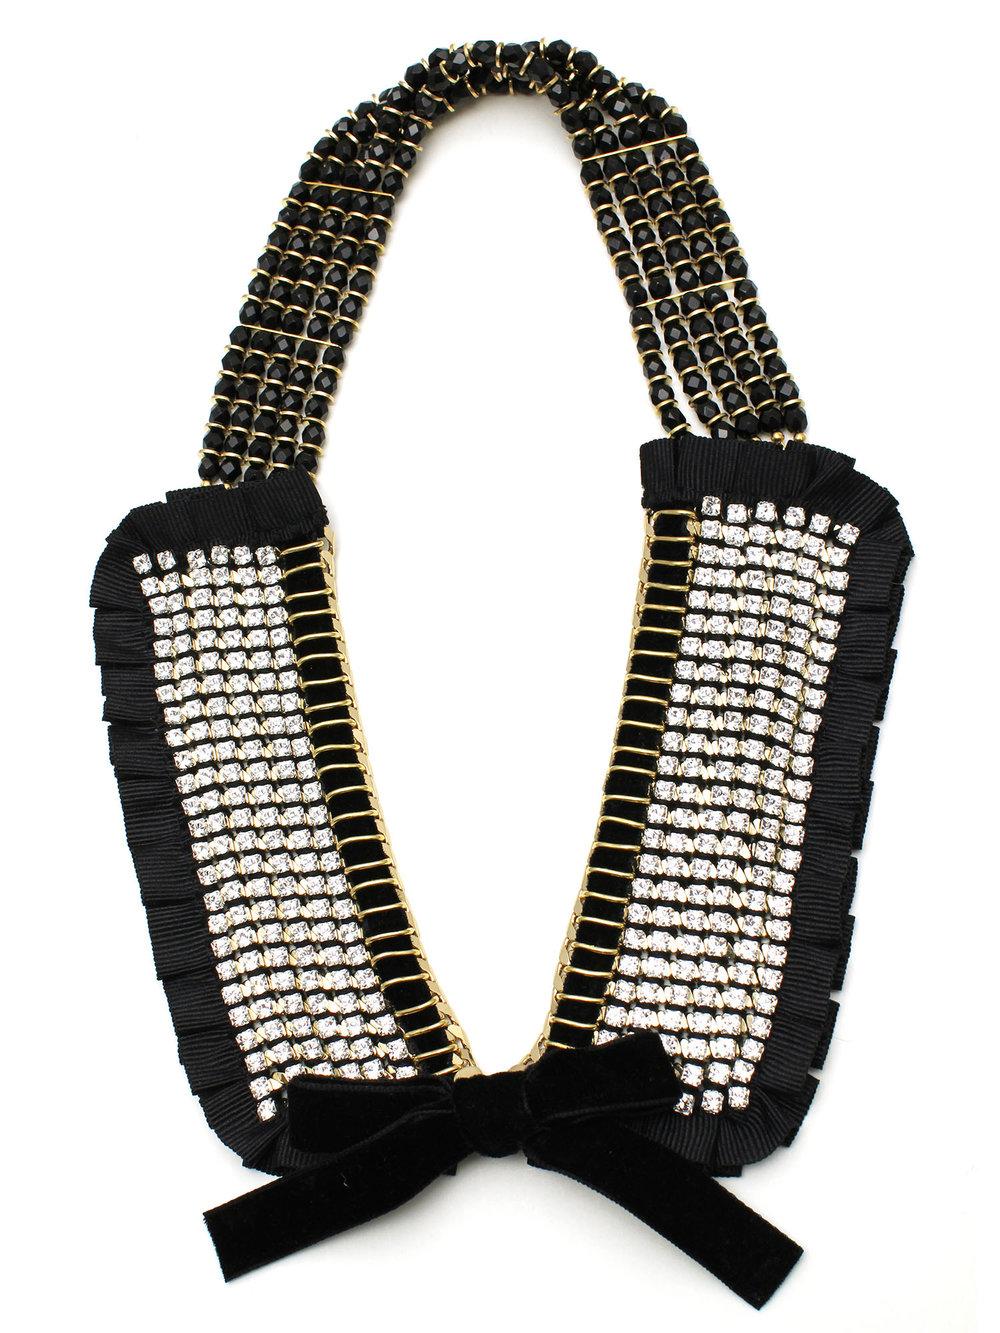 064 - Black Ruffle Crystal Collar.jpg